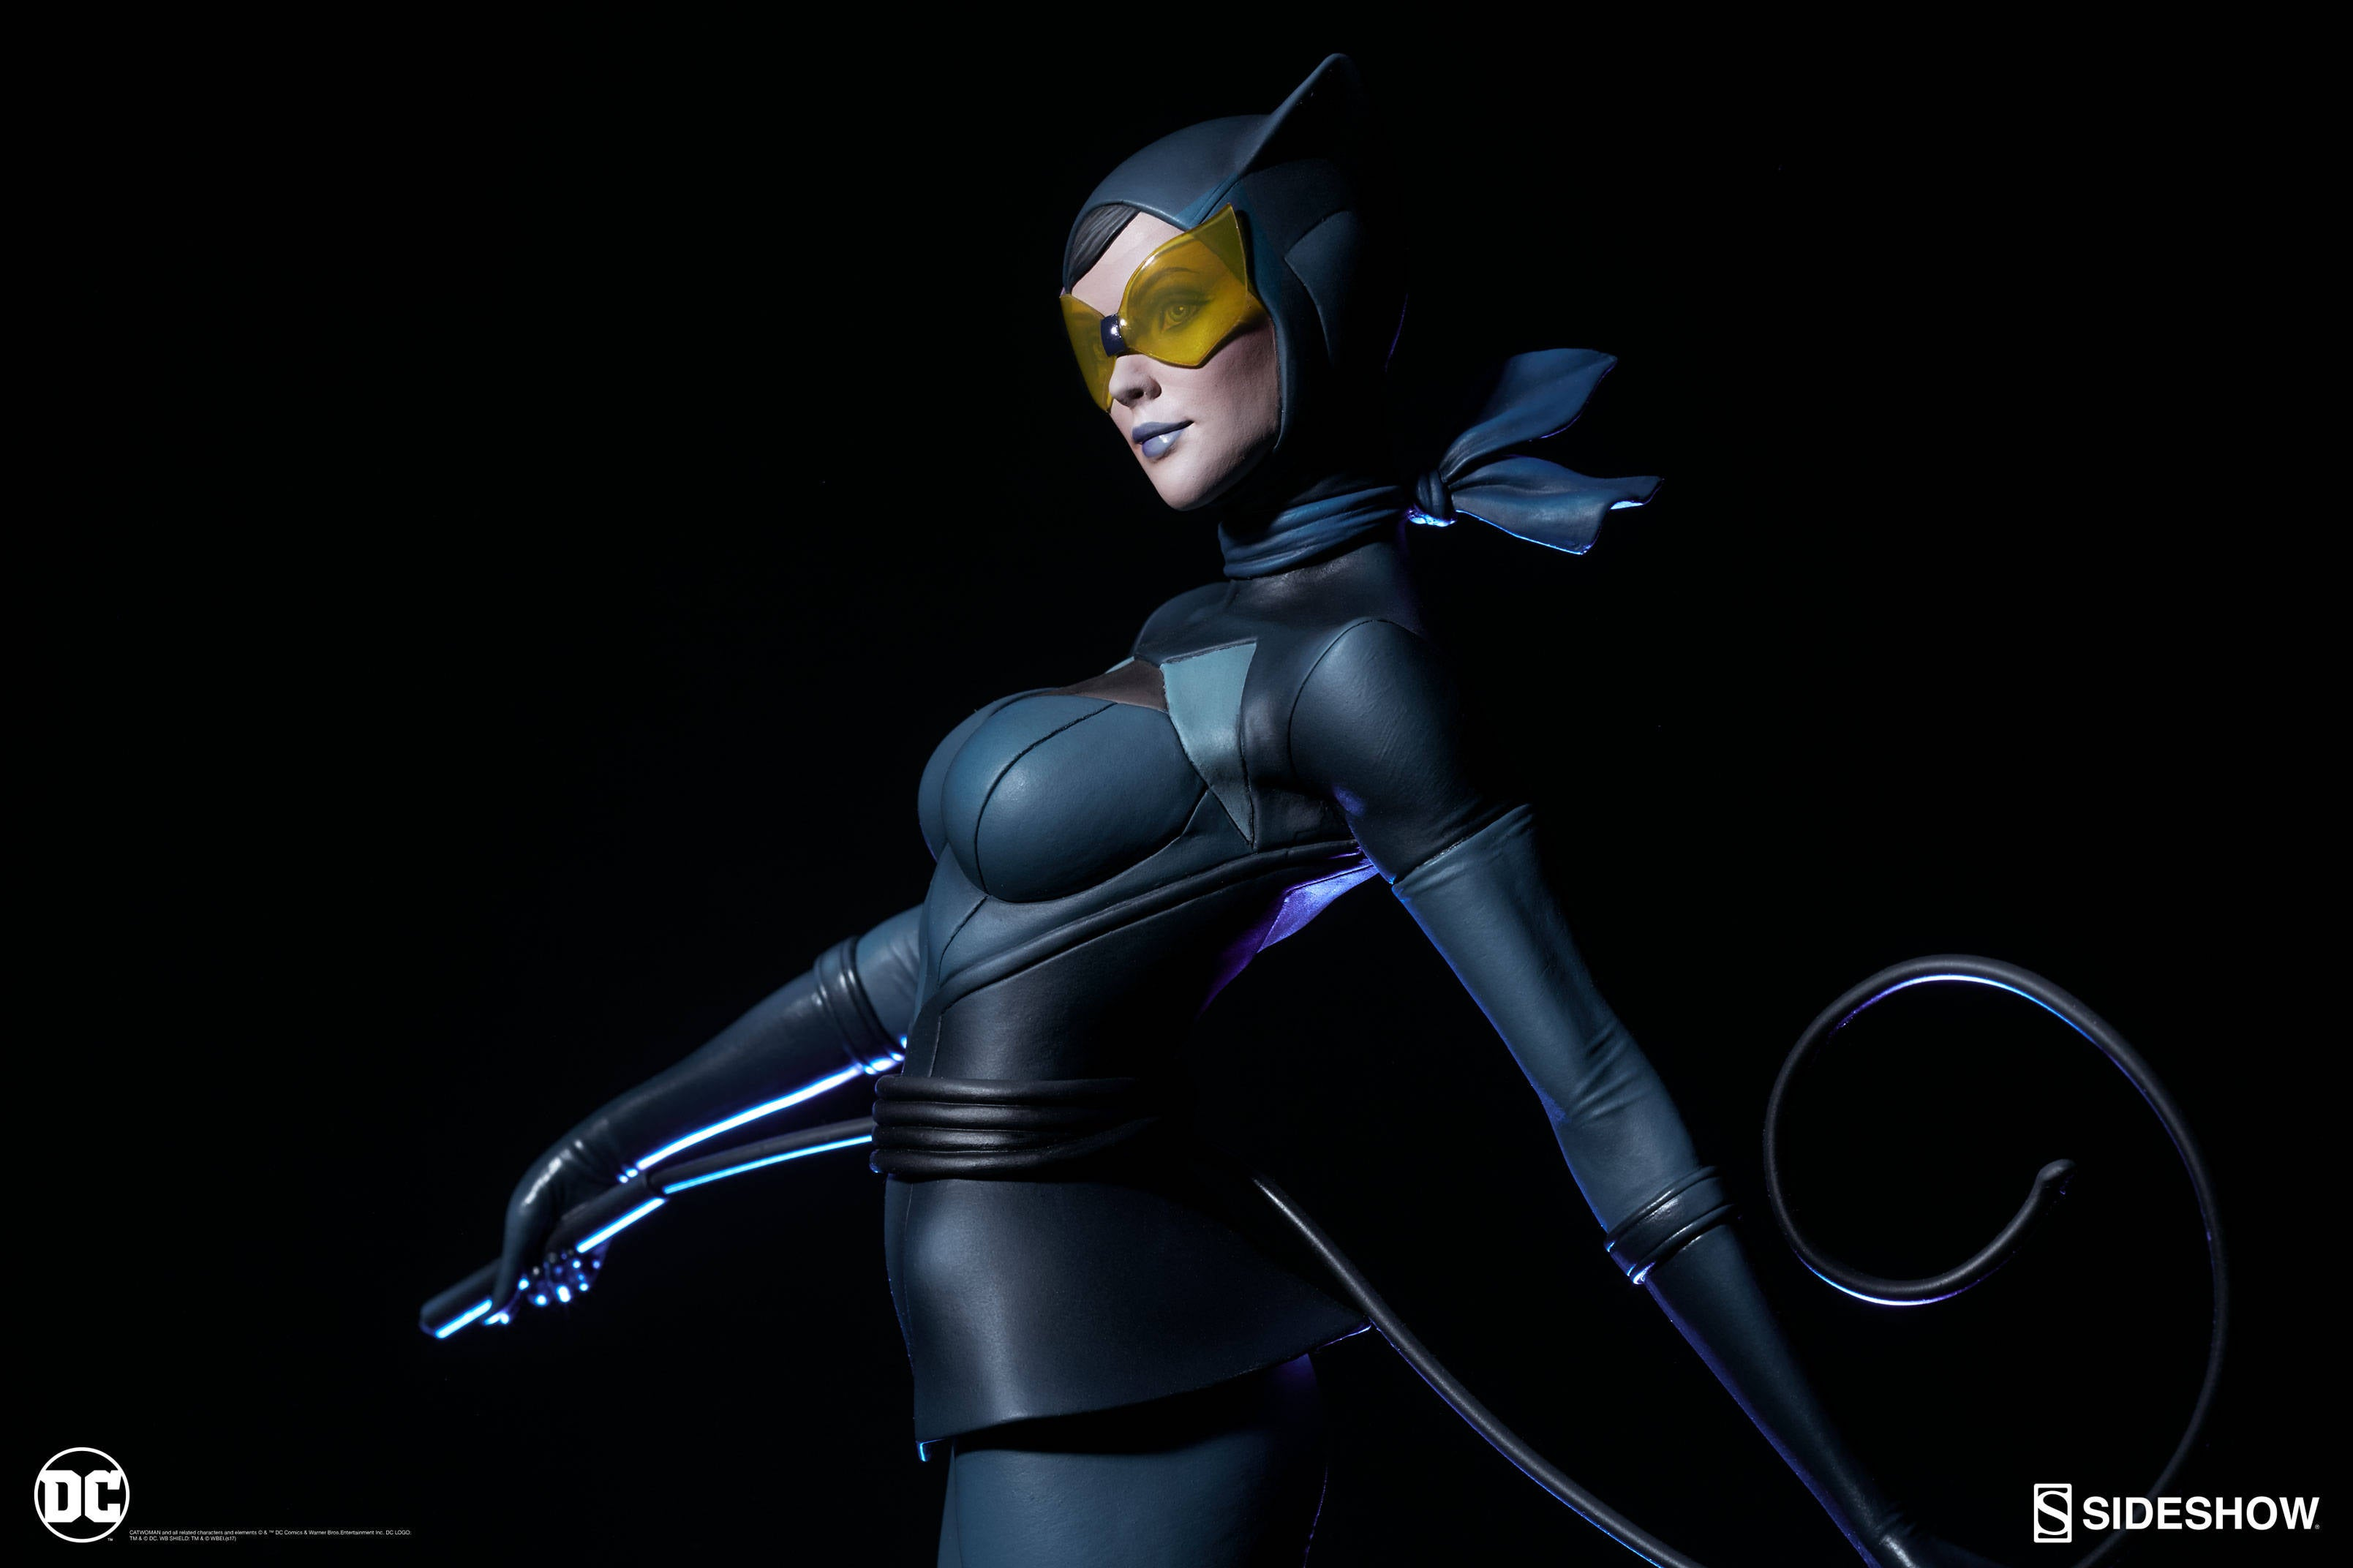 Catwoman-Sideshow-Artgerm-Statue01